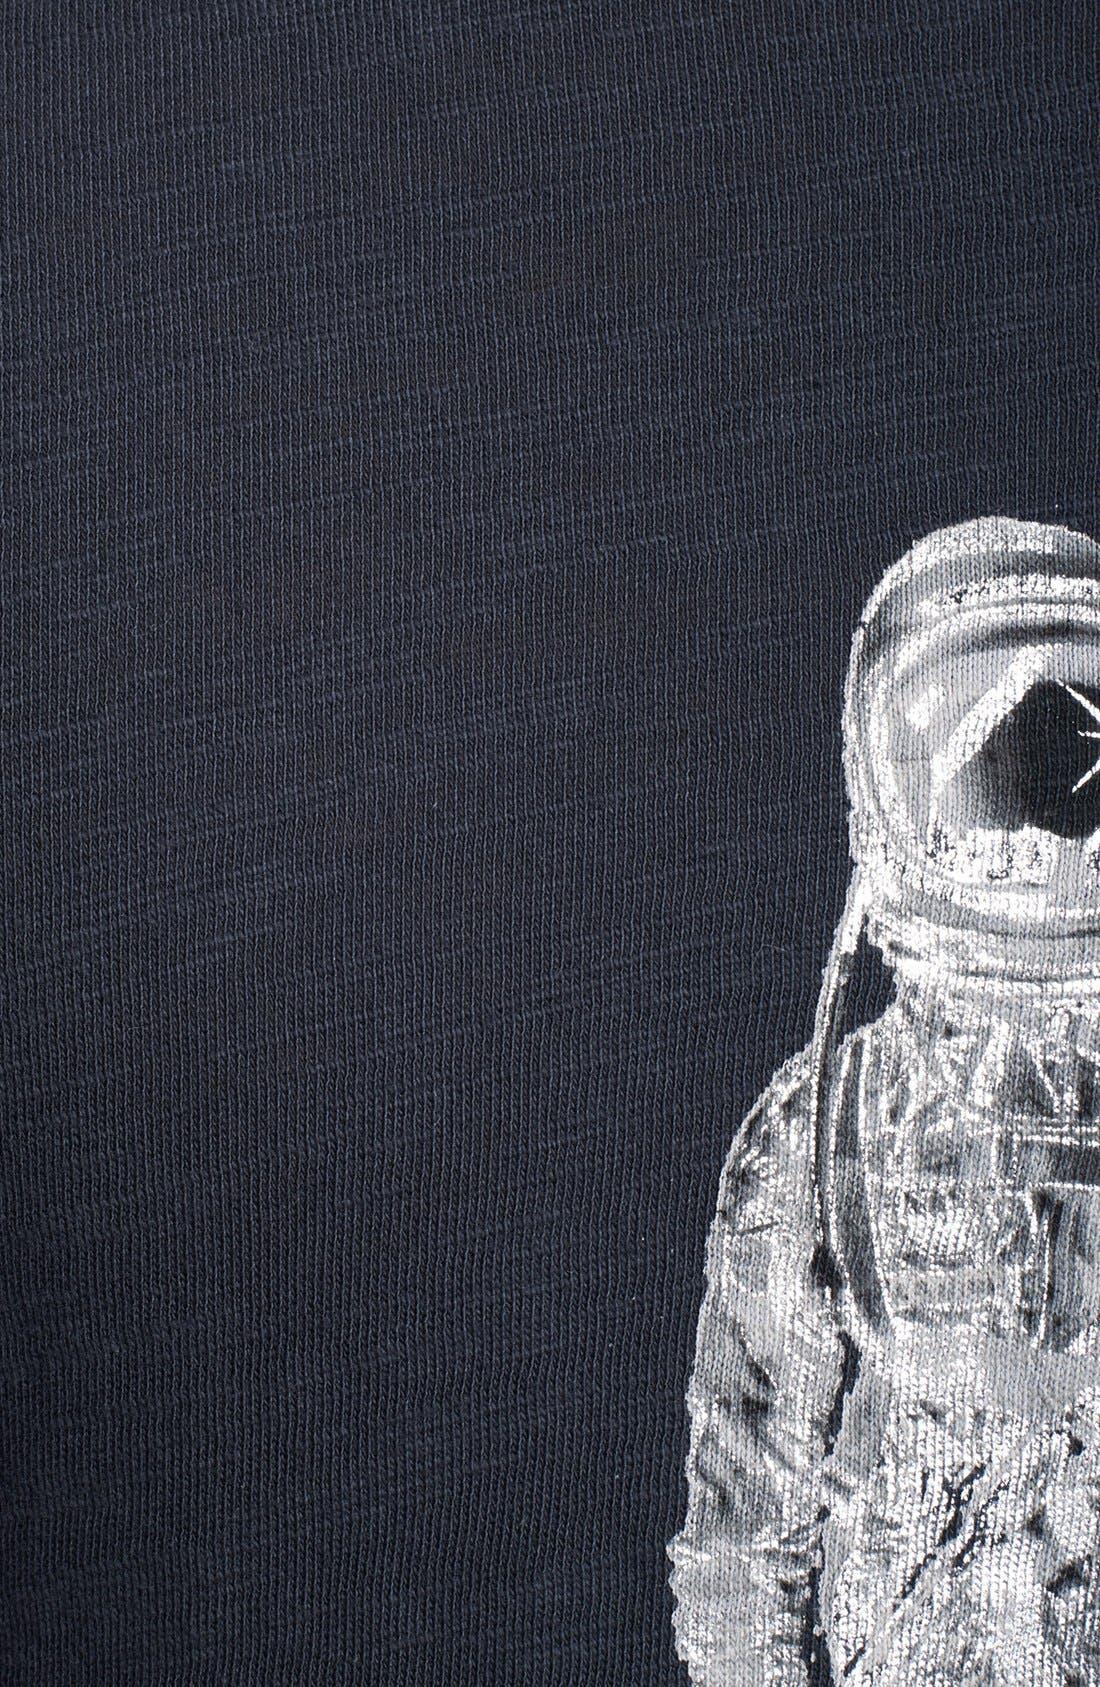 Alternate Image 3  - rag & bone 'Spaceman' Graphic Crewneck Pocket T-Shirt